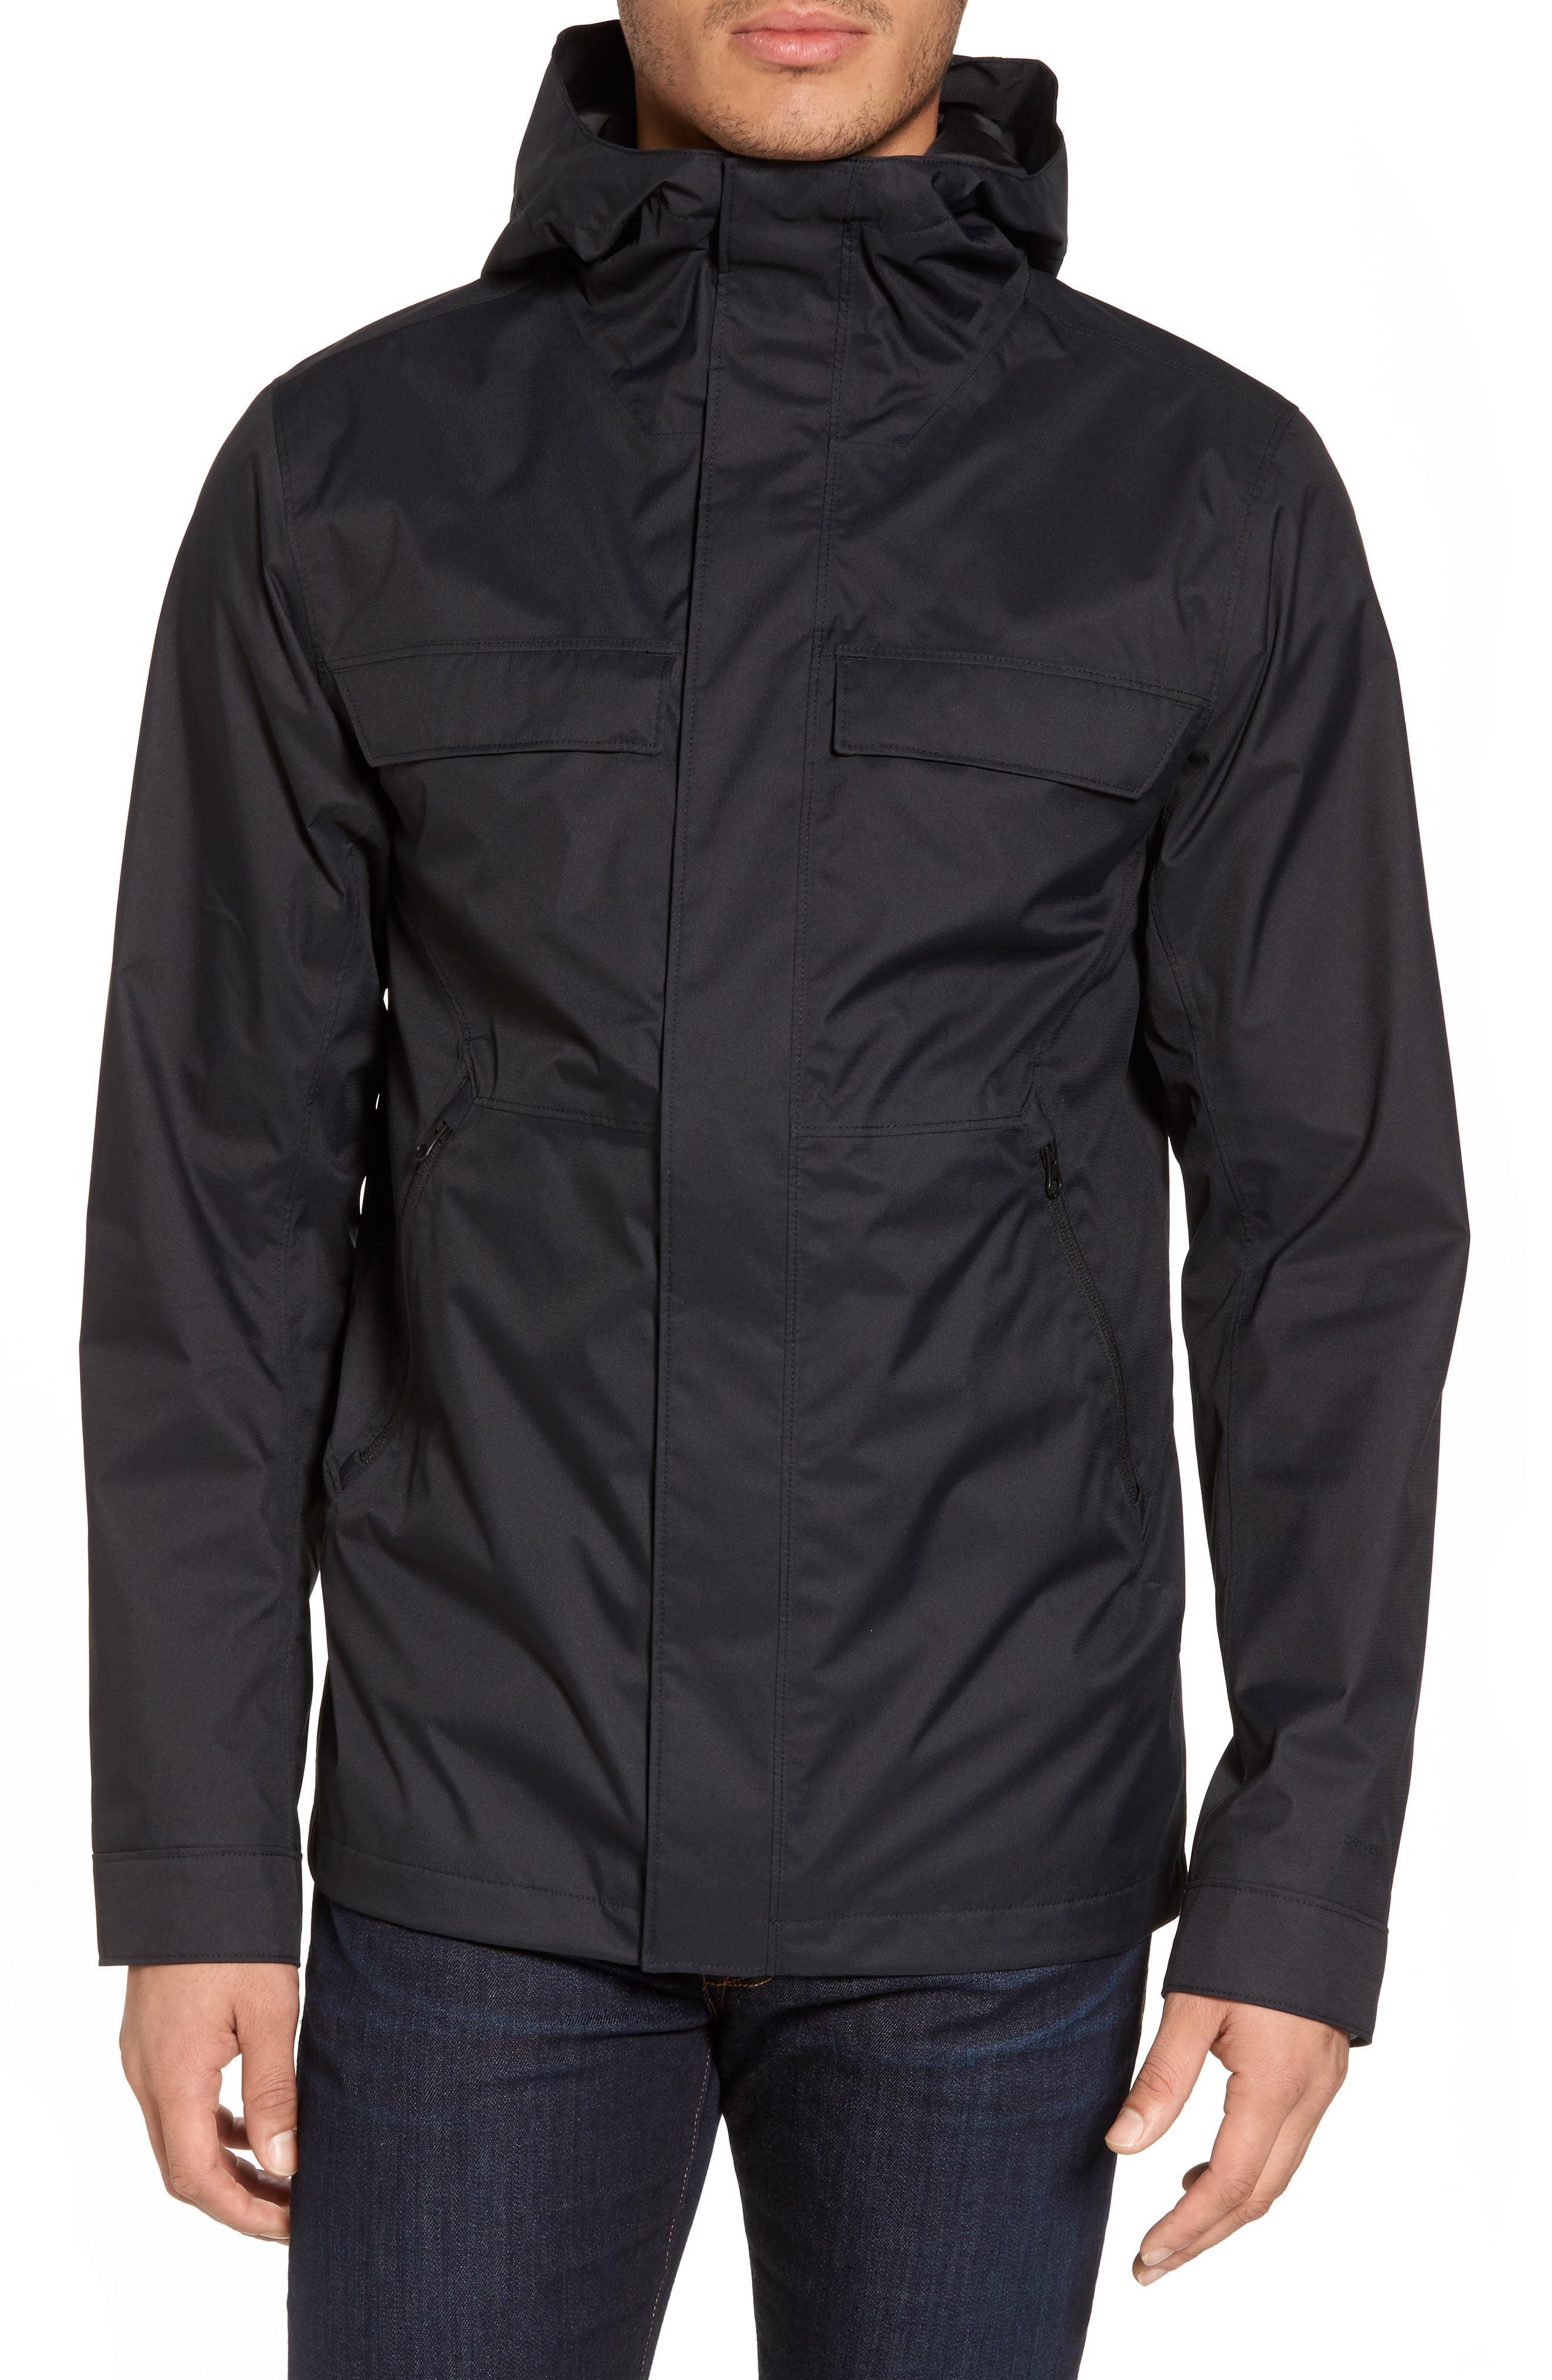 Jenison II Insulated Waterproof Jacket,                             Alternate thumbnail 4, color,                             Tnf Black